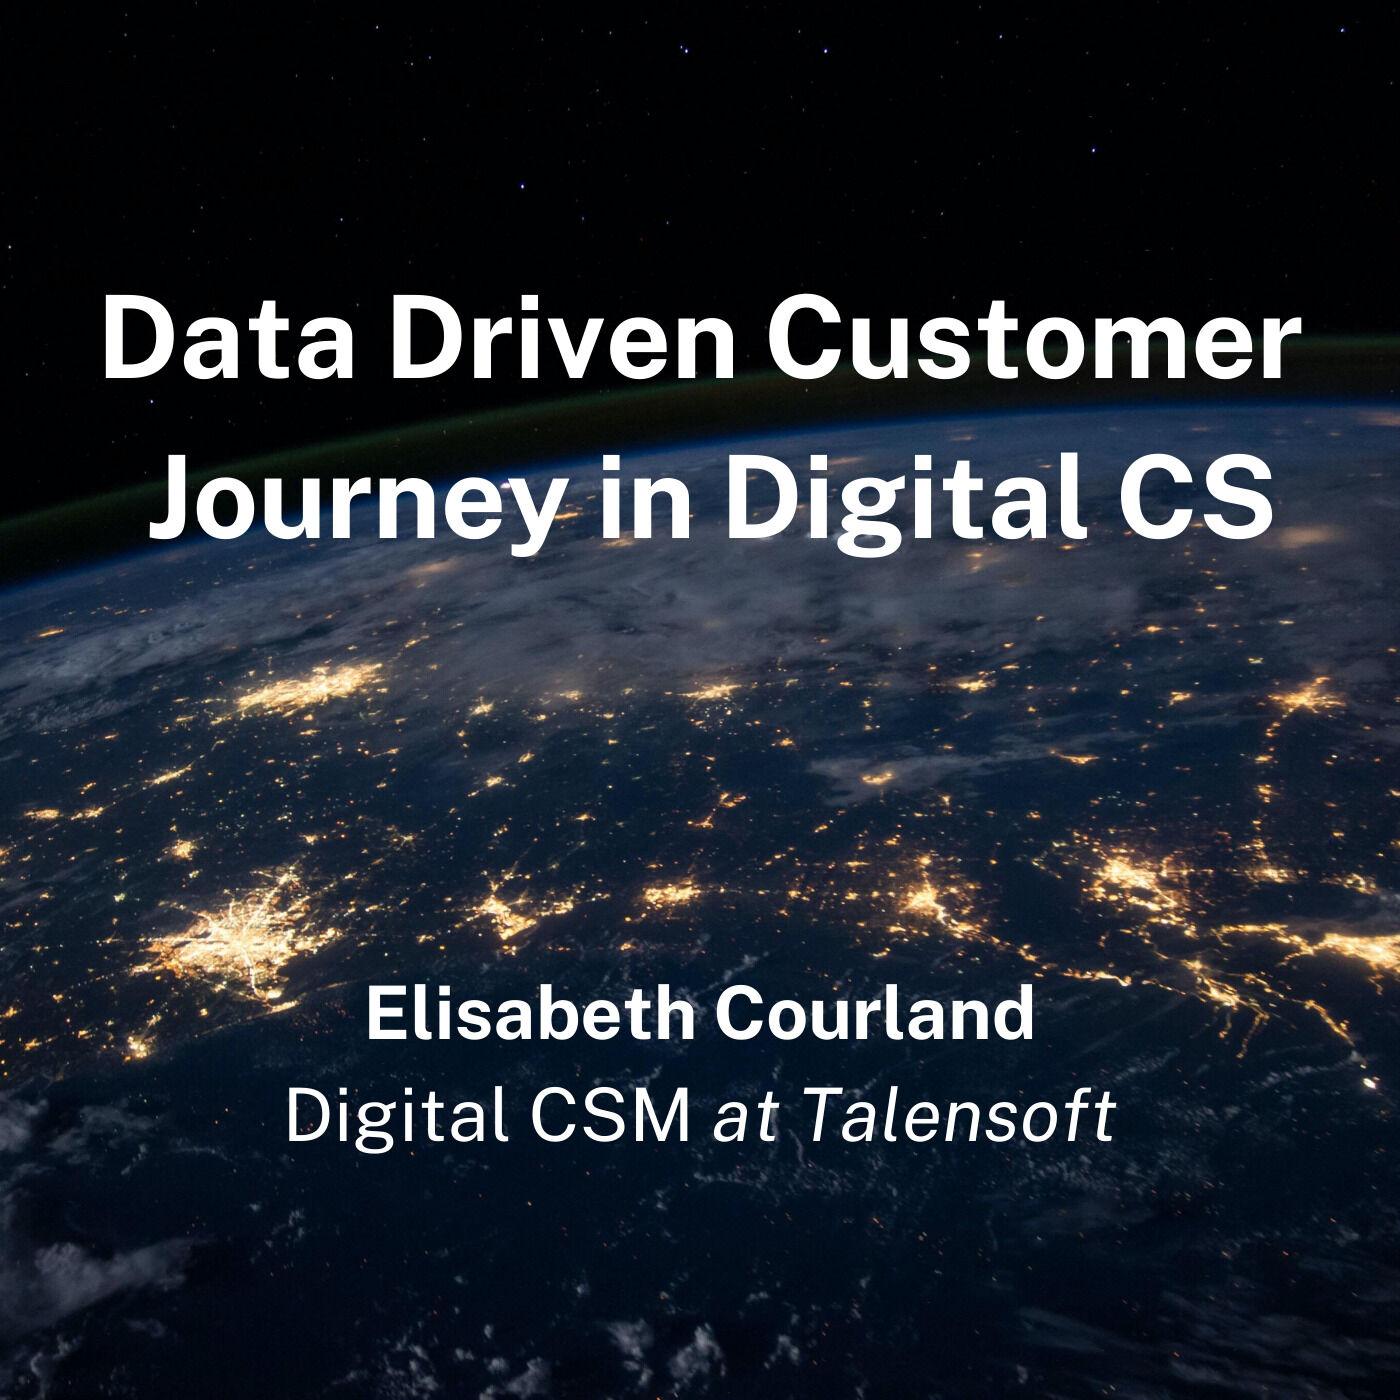 Elisabeth Courland, Digital CSM at Talentsoft - Data Driven Customer Journey in Digital CS